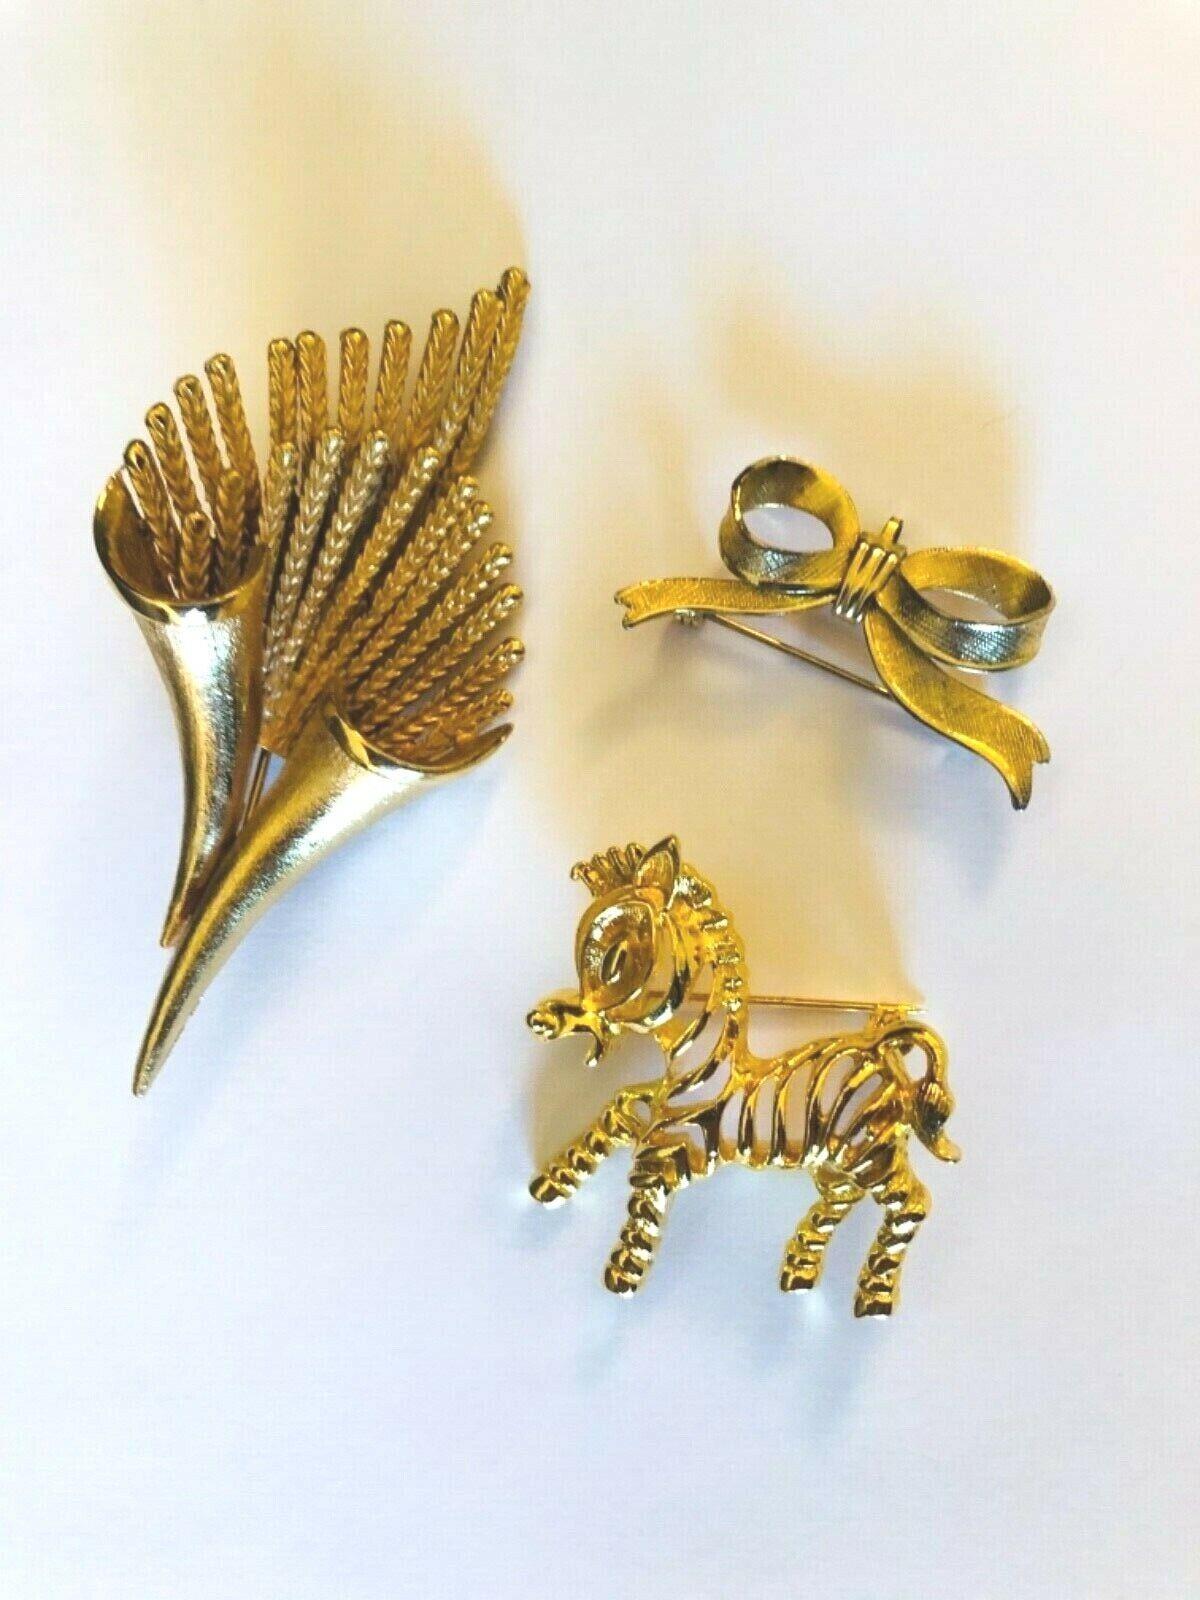 Lovely vintage textured goldtone tiger eye leaf figural brooch and matching screwback earrings set